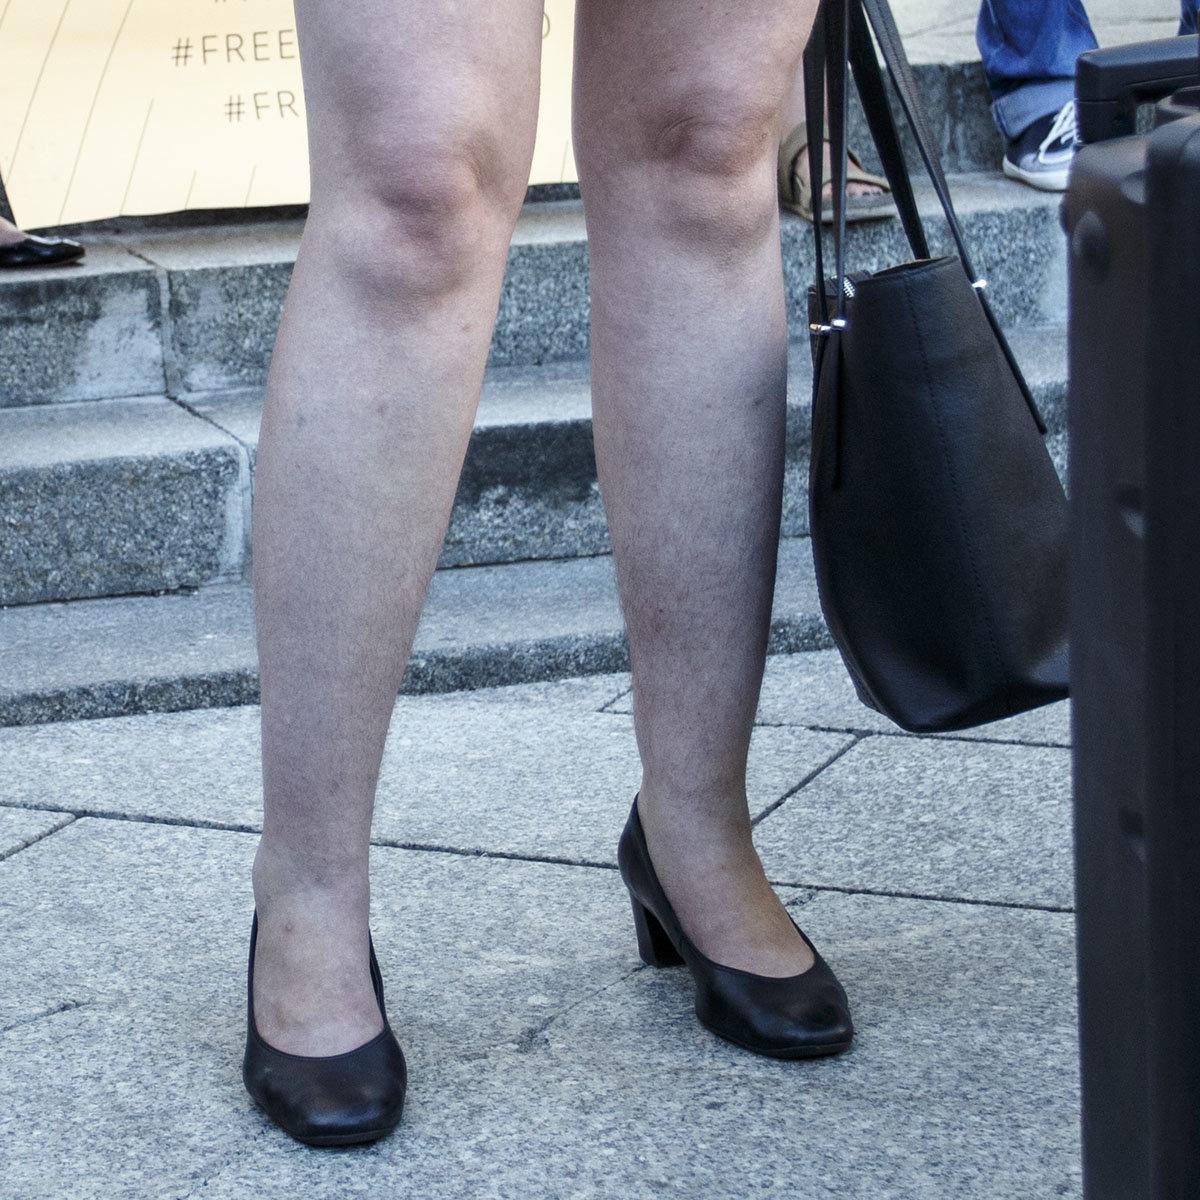 видео женских волосатых ног